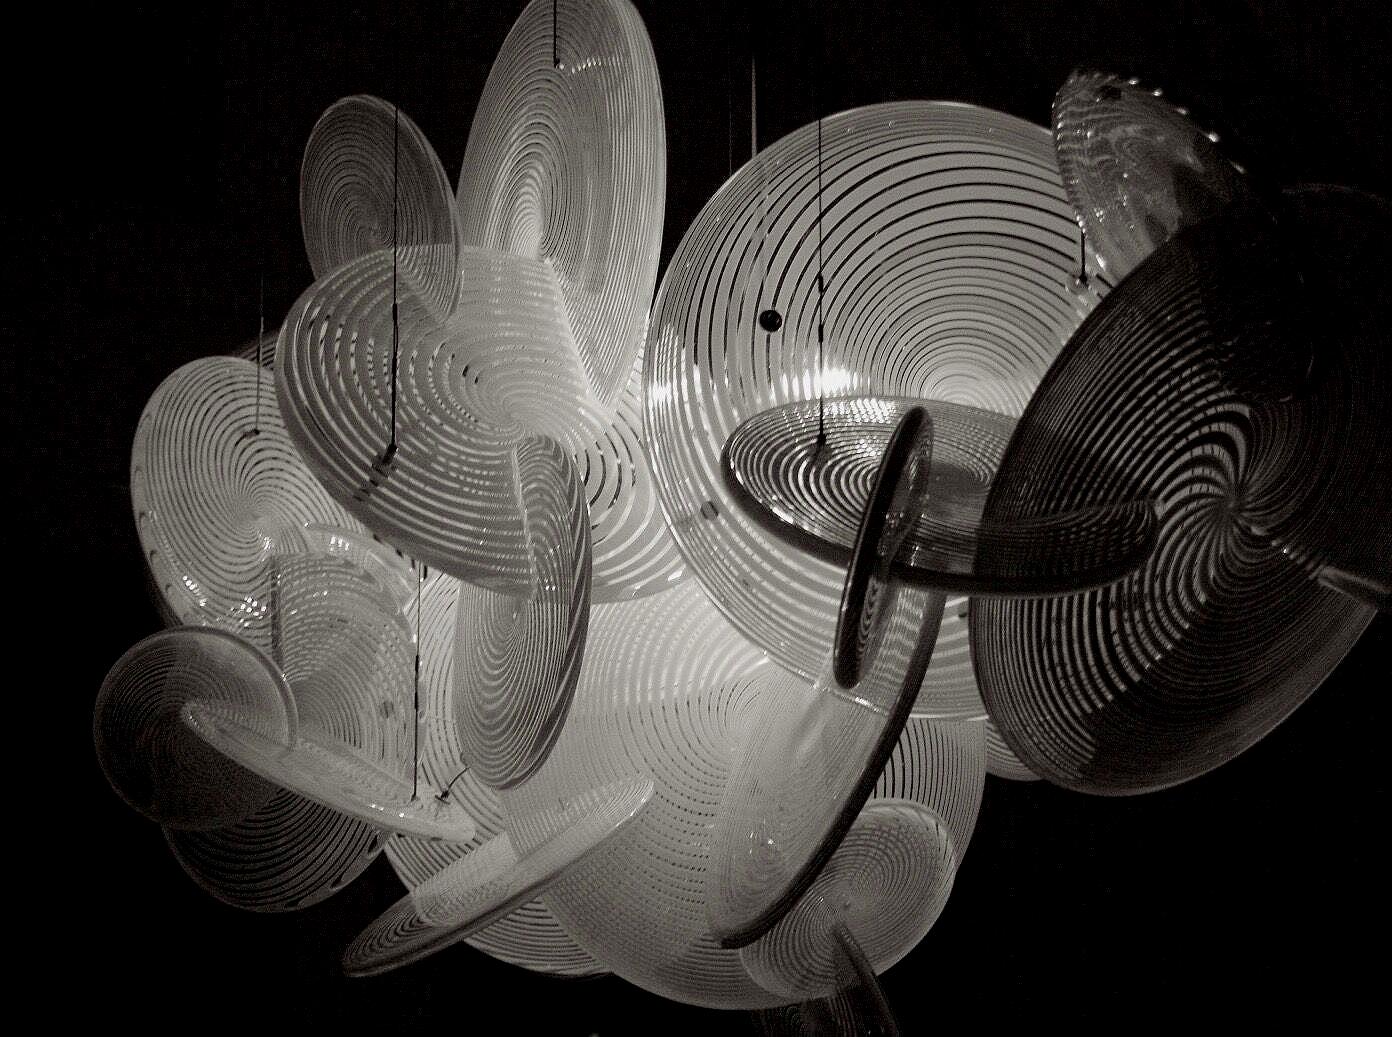 "Venetian Hypnotic Illuminated Sculpture  Hand Blown Glass Venetian Discs, Stainless Steel, Light Dimensions: 56"" wide x 32""H x 62"" Drop By Deborah Czeresko"